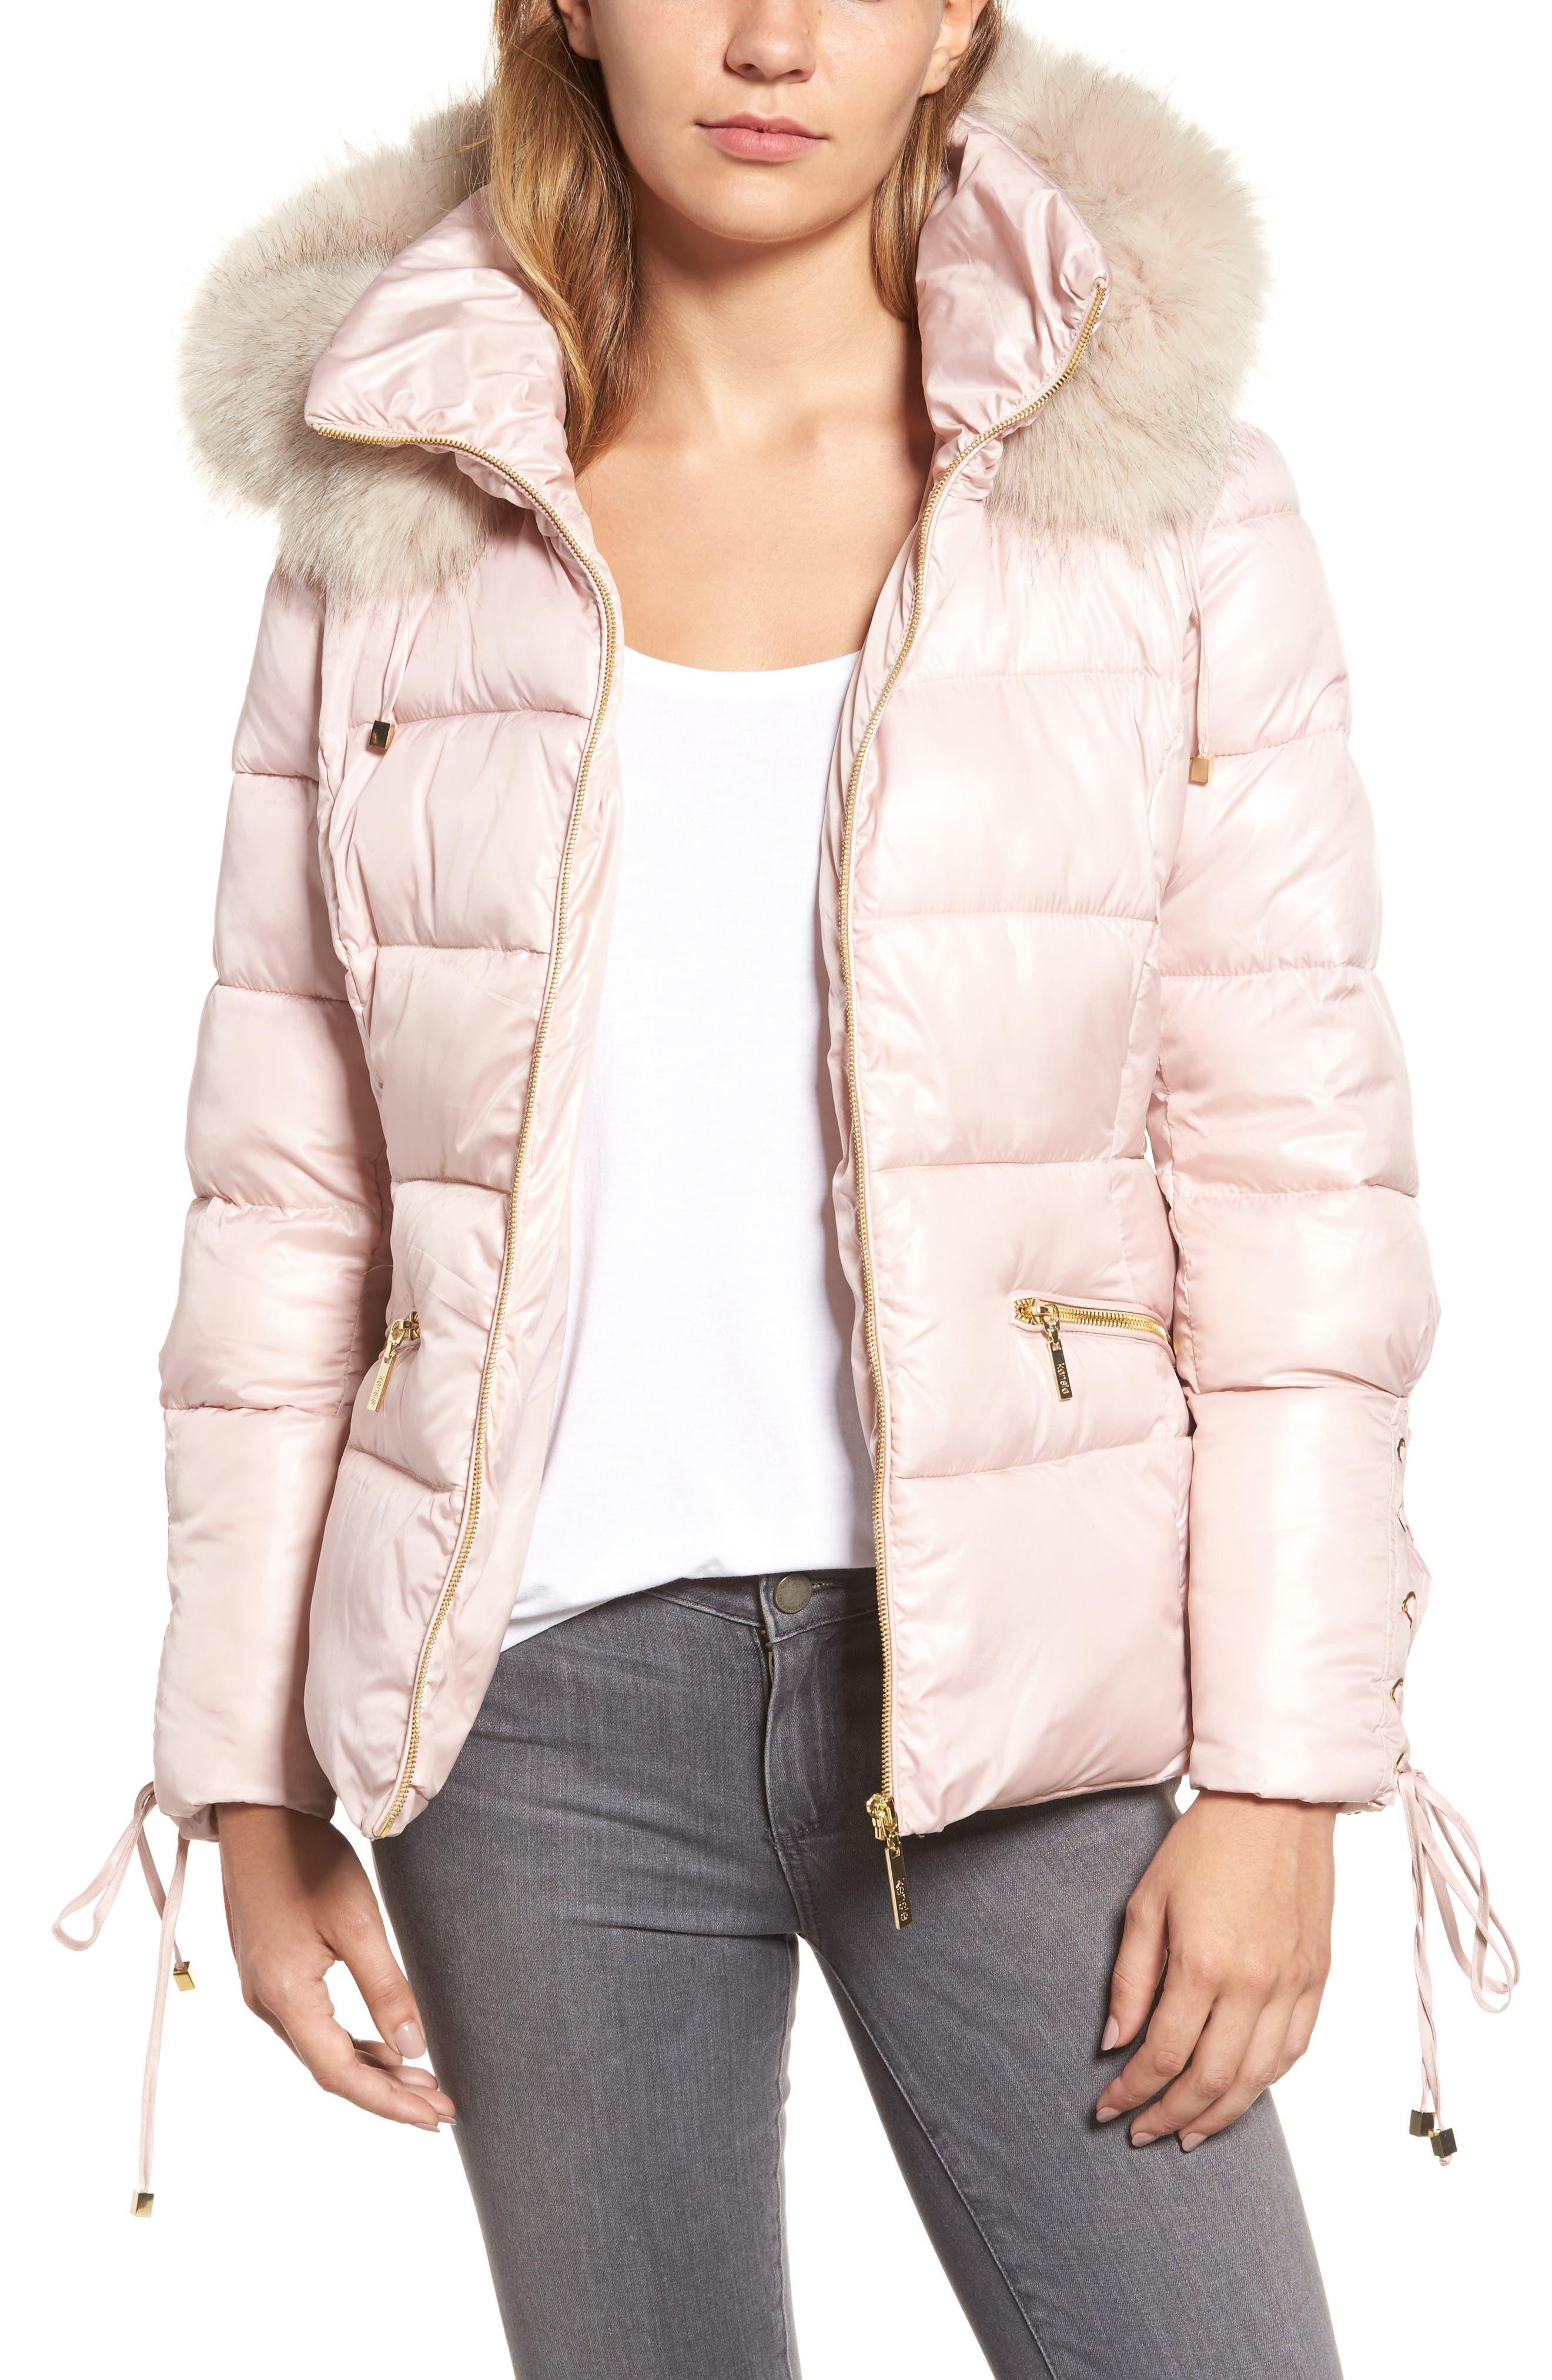 Main Image - kensie Lace Sleeve Puffer Coat with Faux Fur Trim Hood